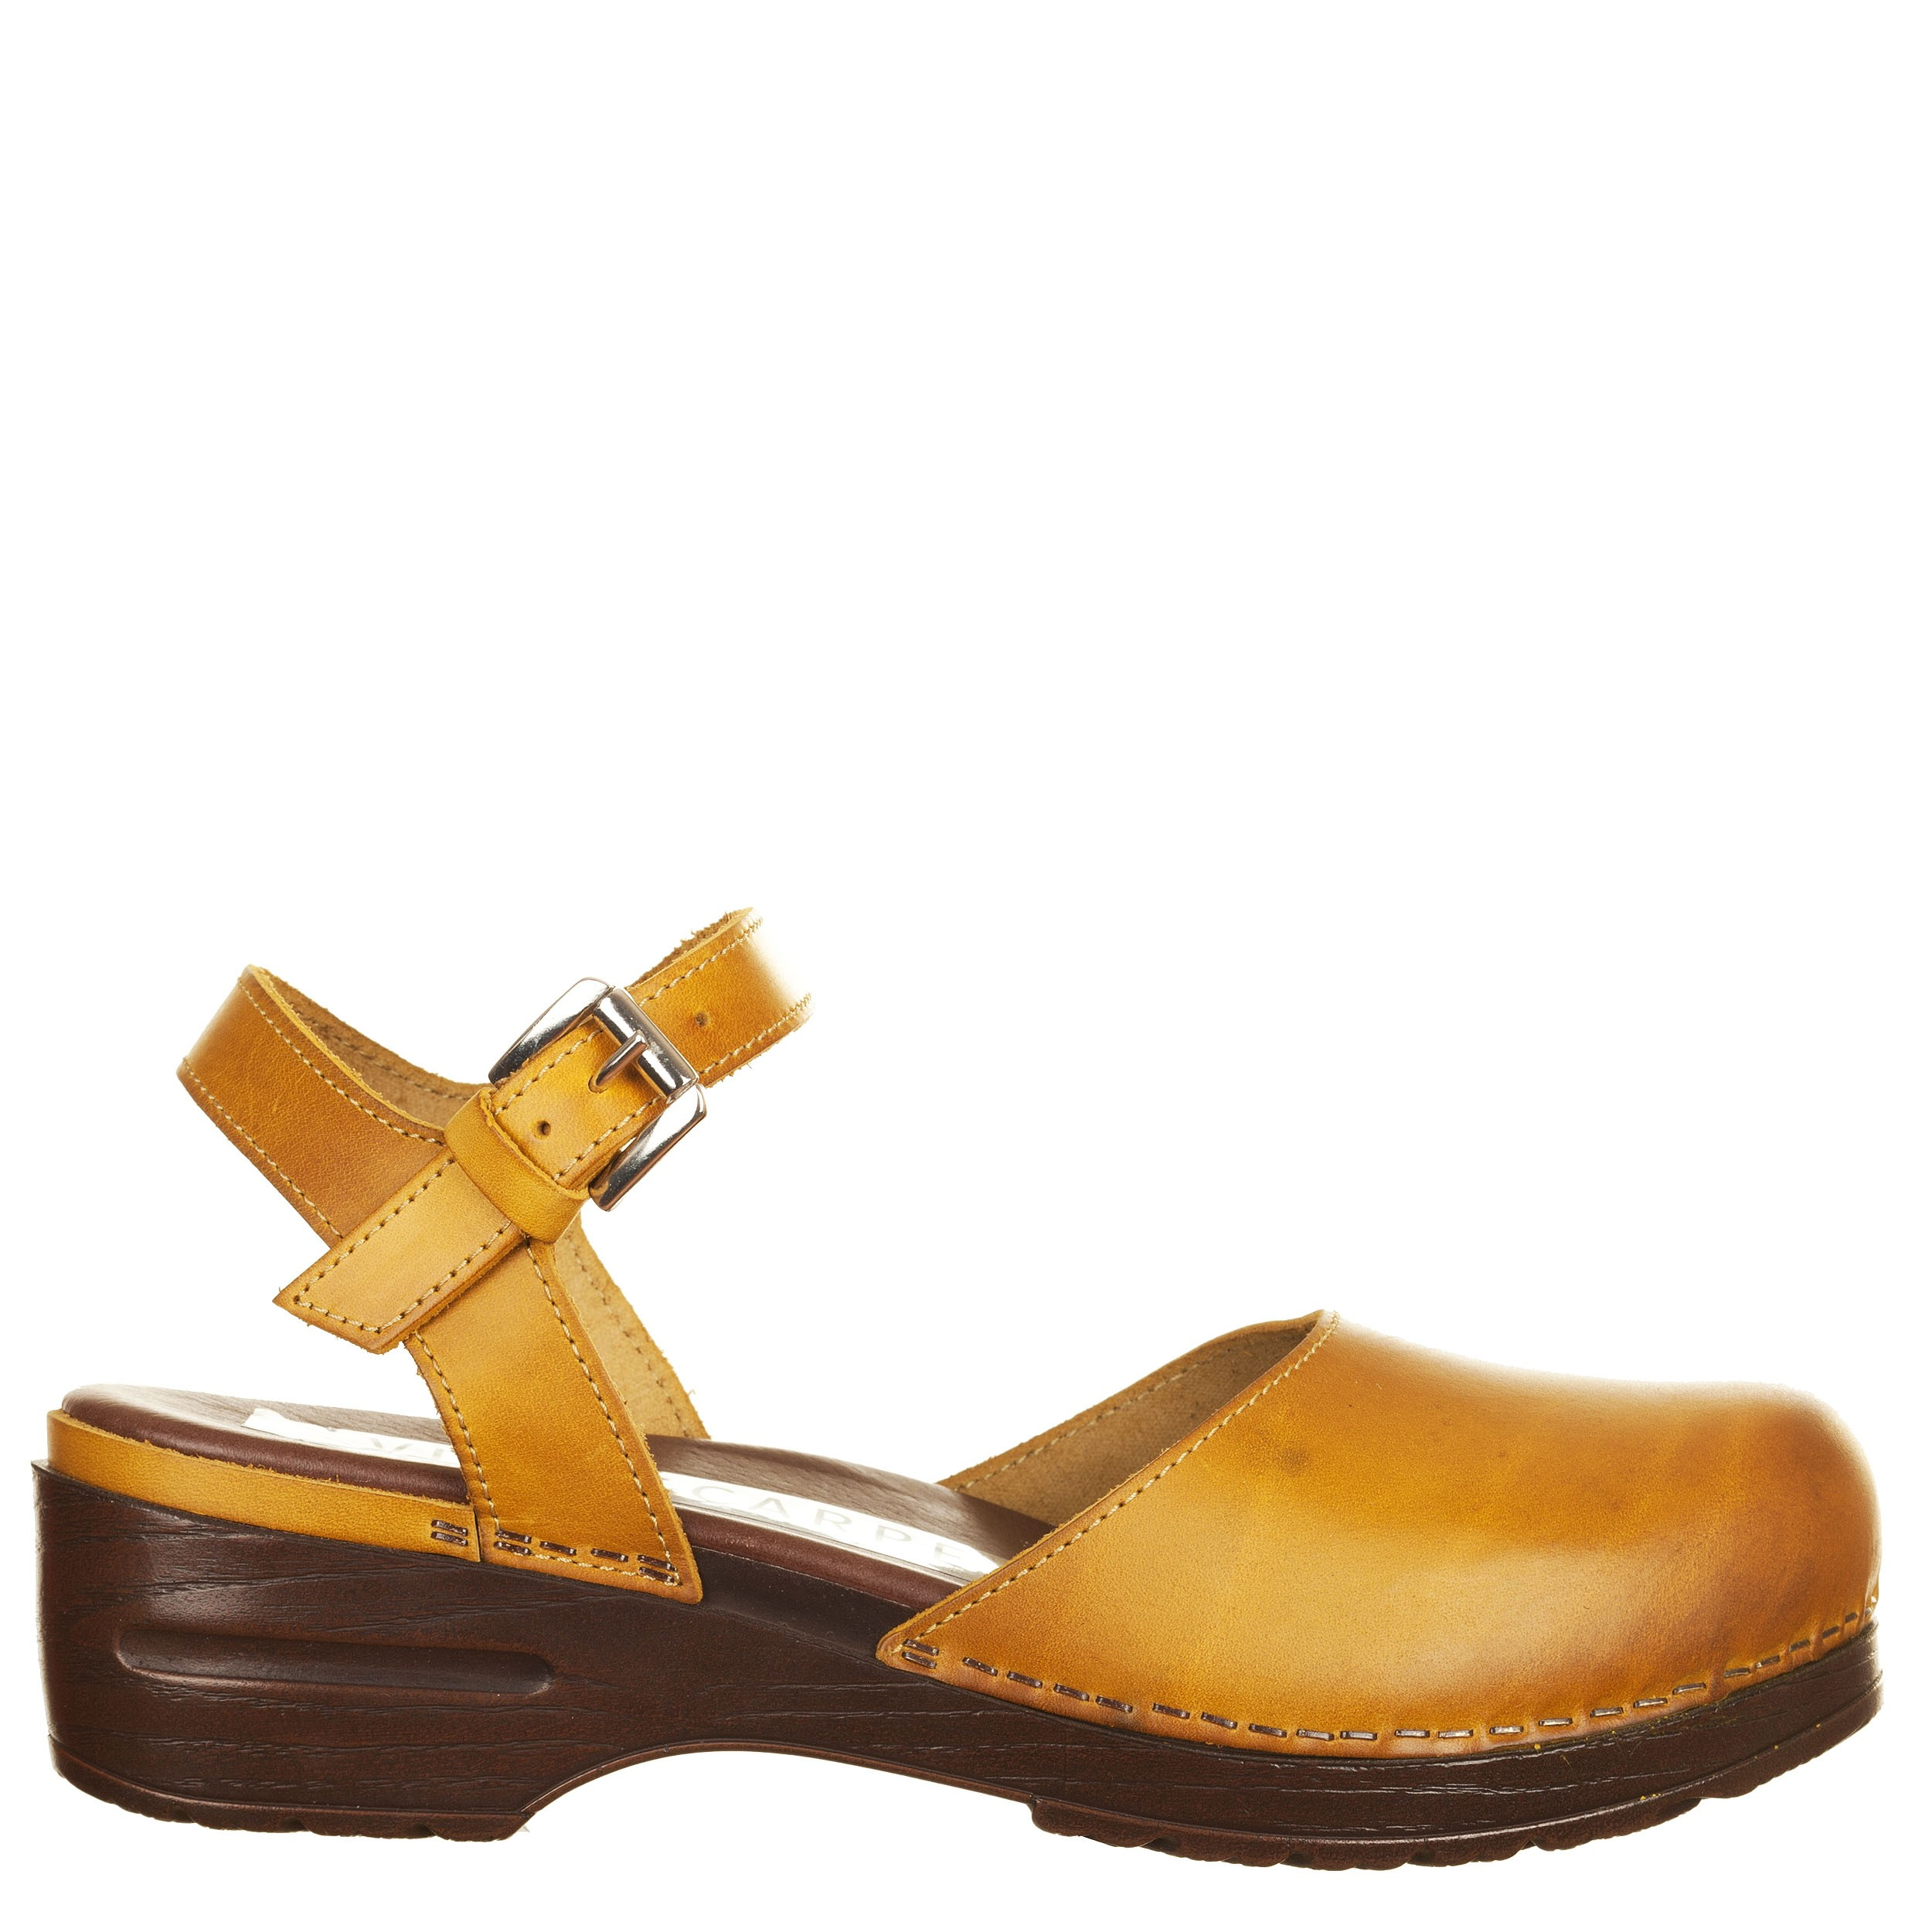 Sandali clogs. Loading zoom